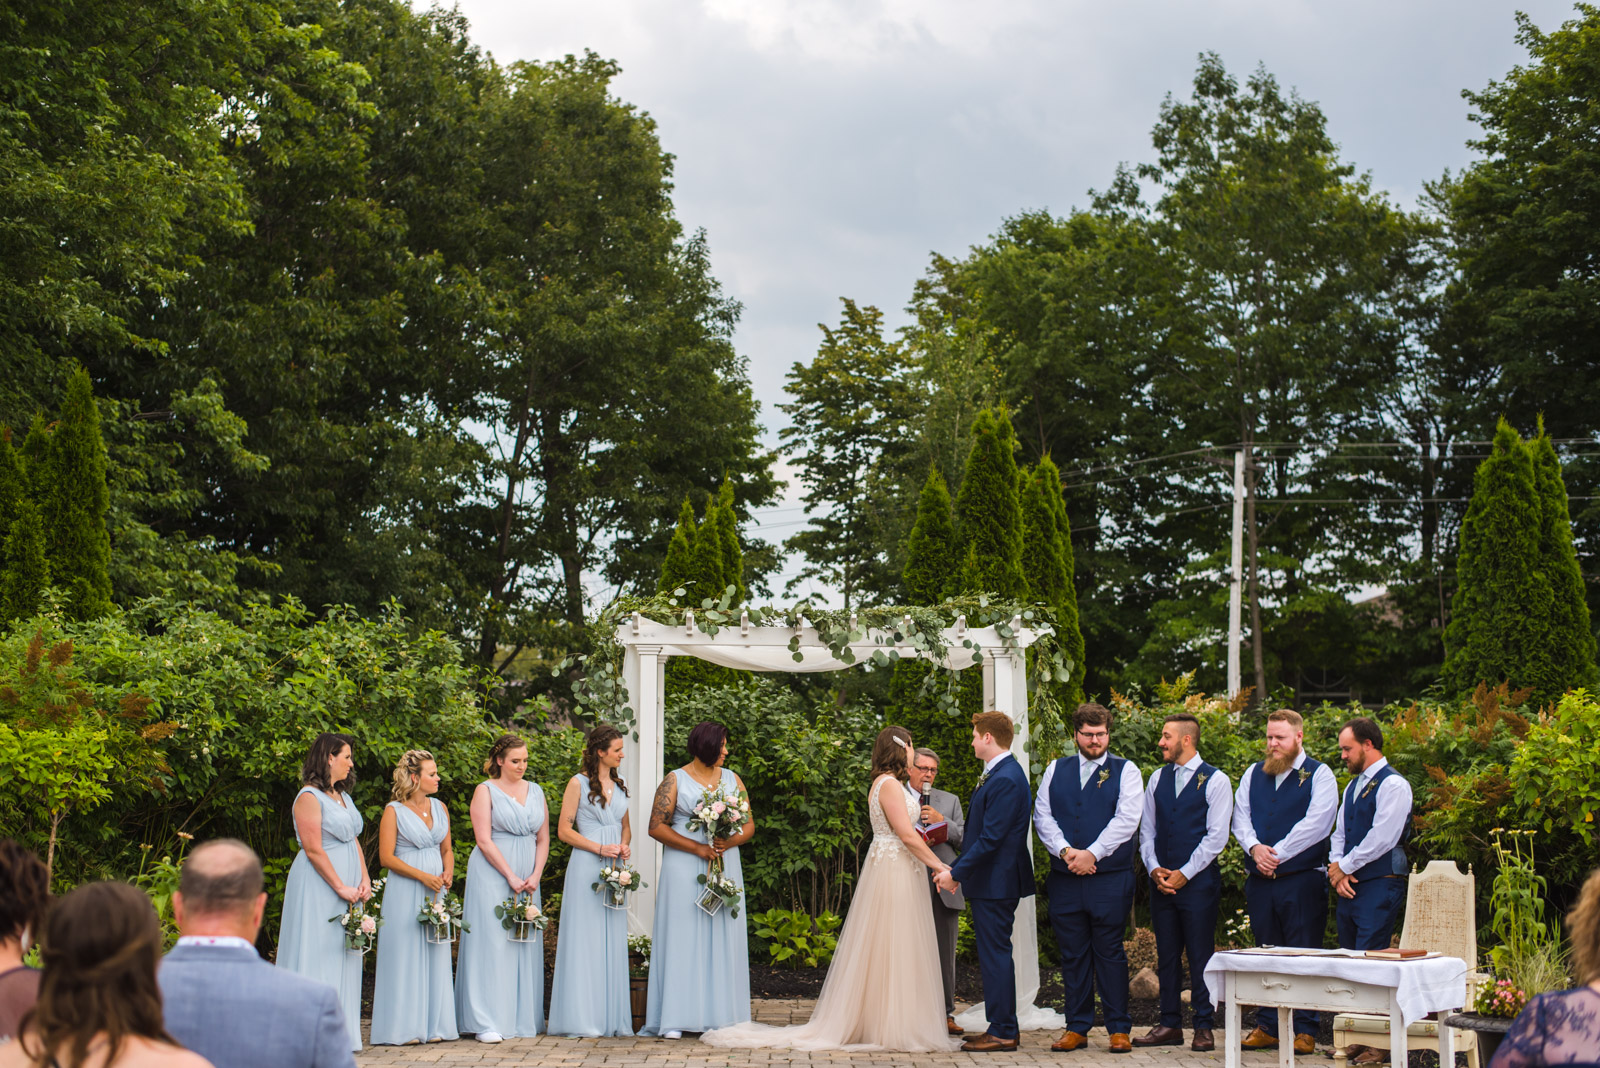 Emerson & Elicia's Golf Course Wedding Aidan & Leanne Hennebry Hamilton Wedding Videographers Photographers Niagara Hush Hush Photography & Film-22.jpg